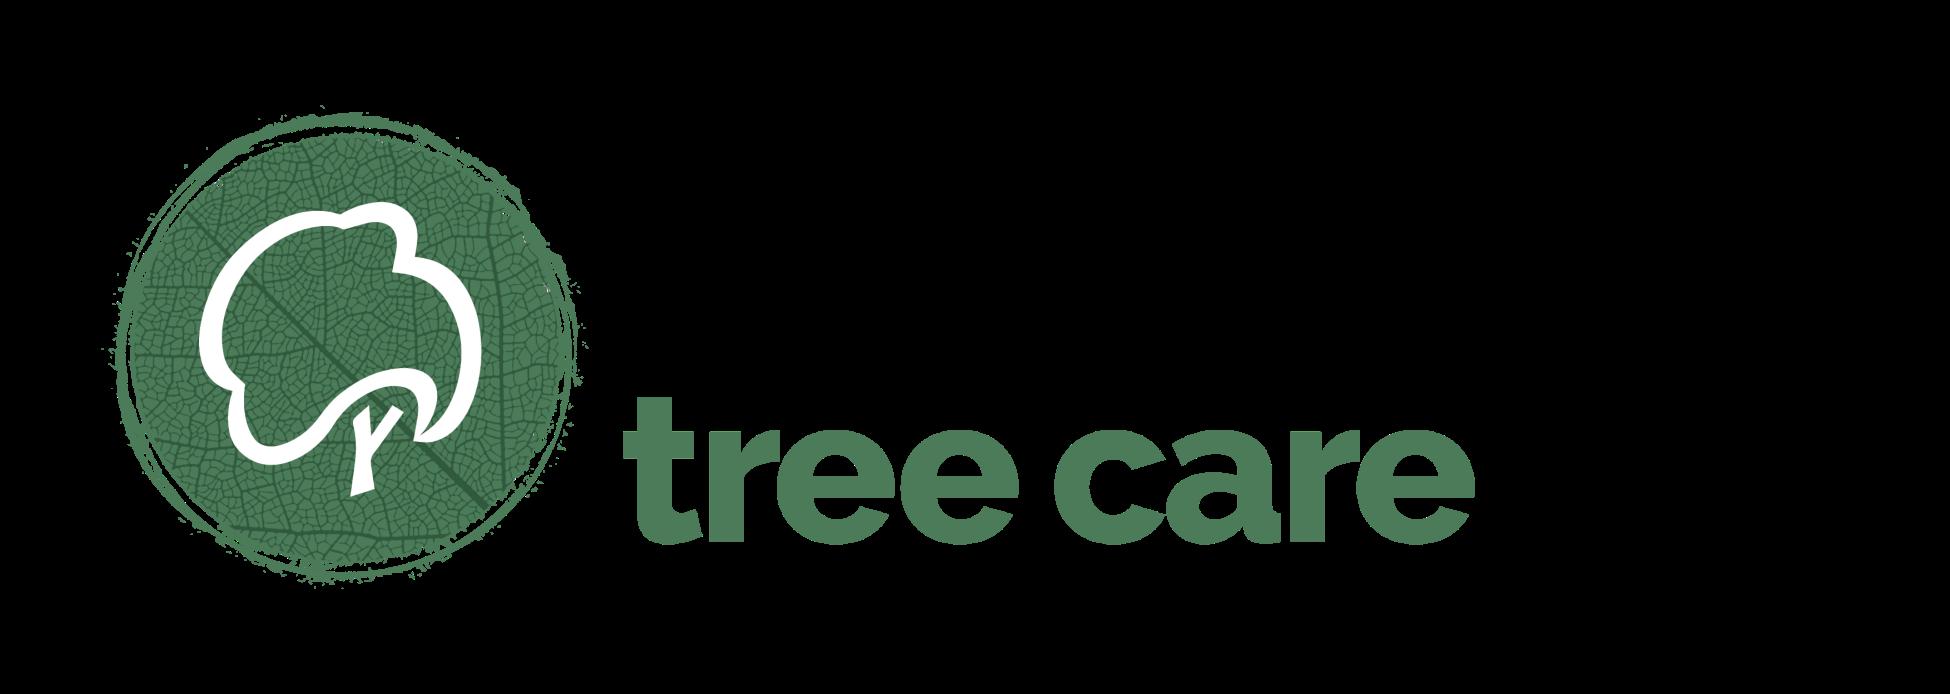 Bawden Tree Care